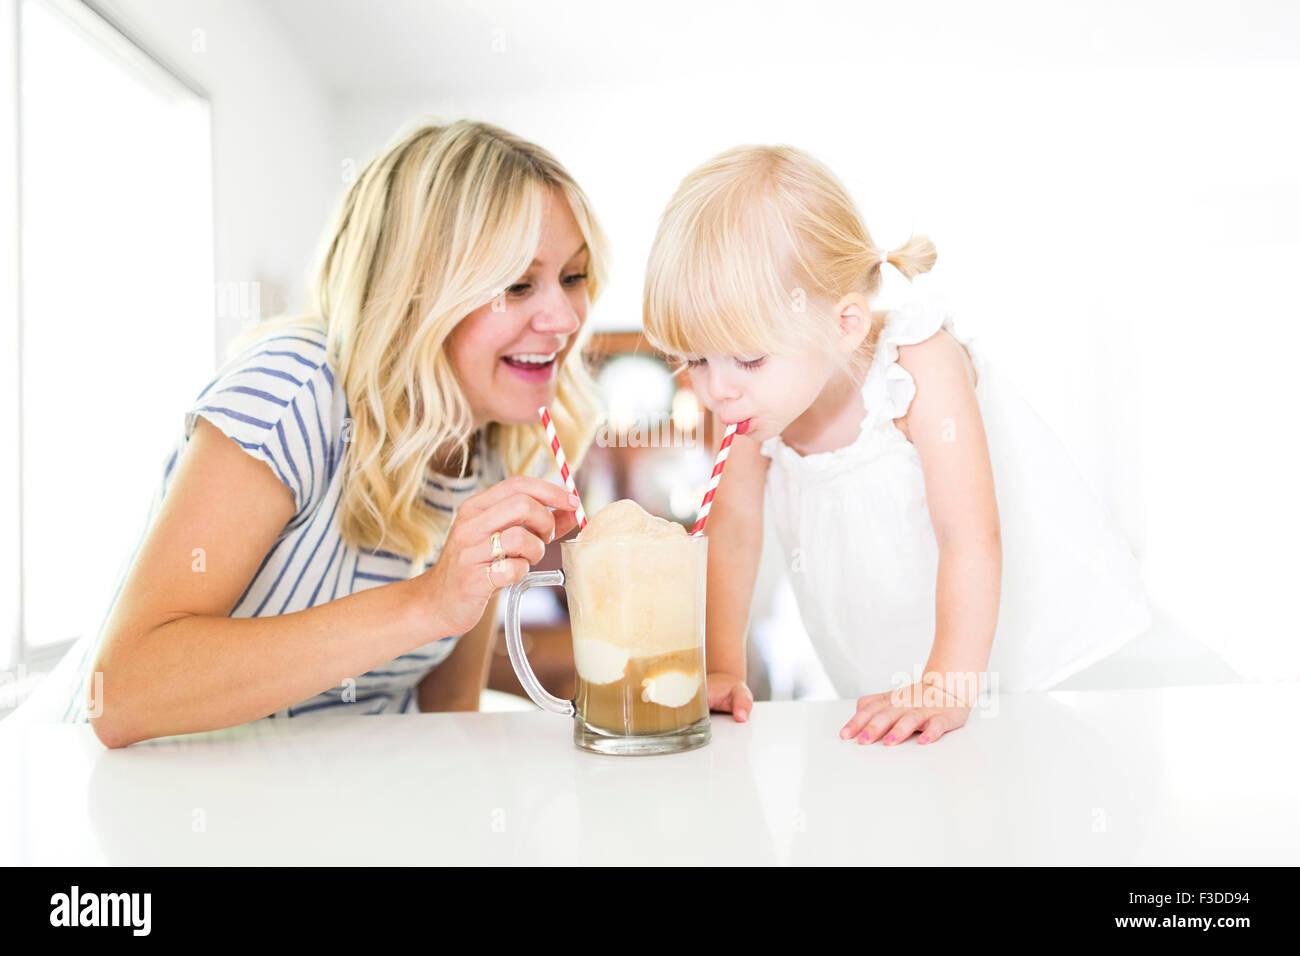 Mother drinking milkshake with daughter (2-3) - Stock Image